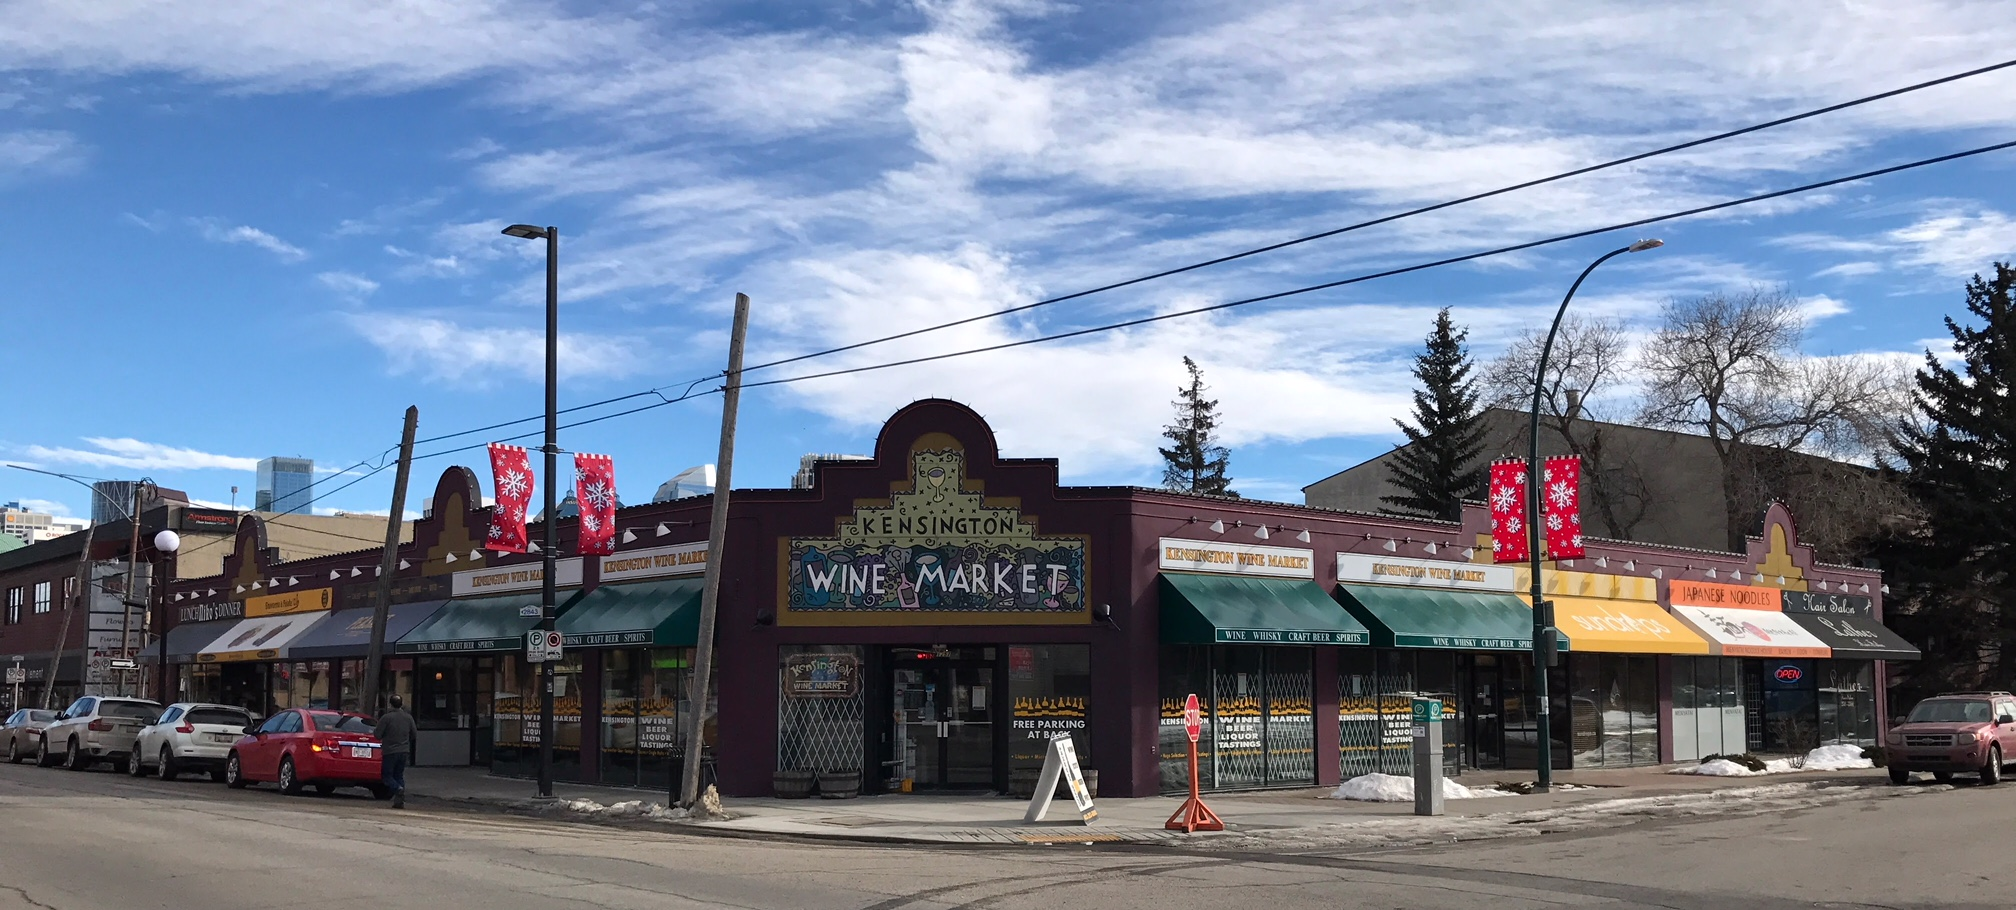 Kensington Wine Market block oozes bohemian charm.